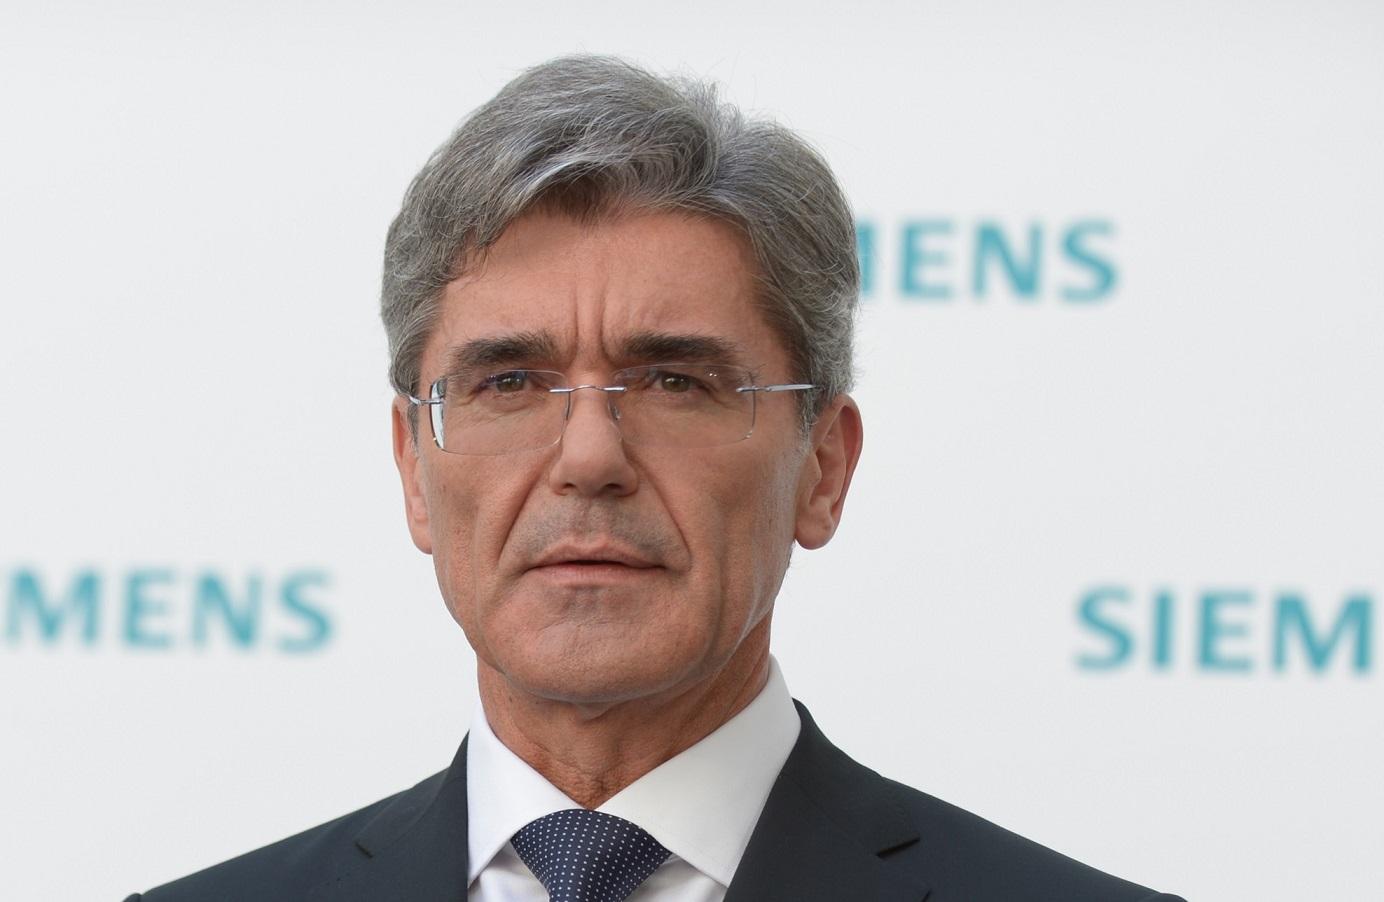 Joe Kaeser, P-DG de Siemens. D. R.